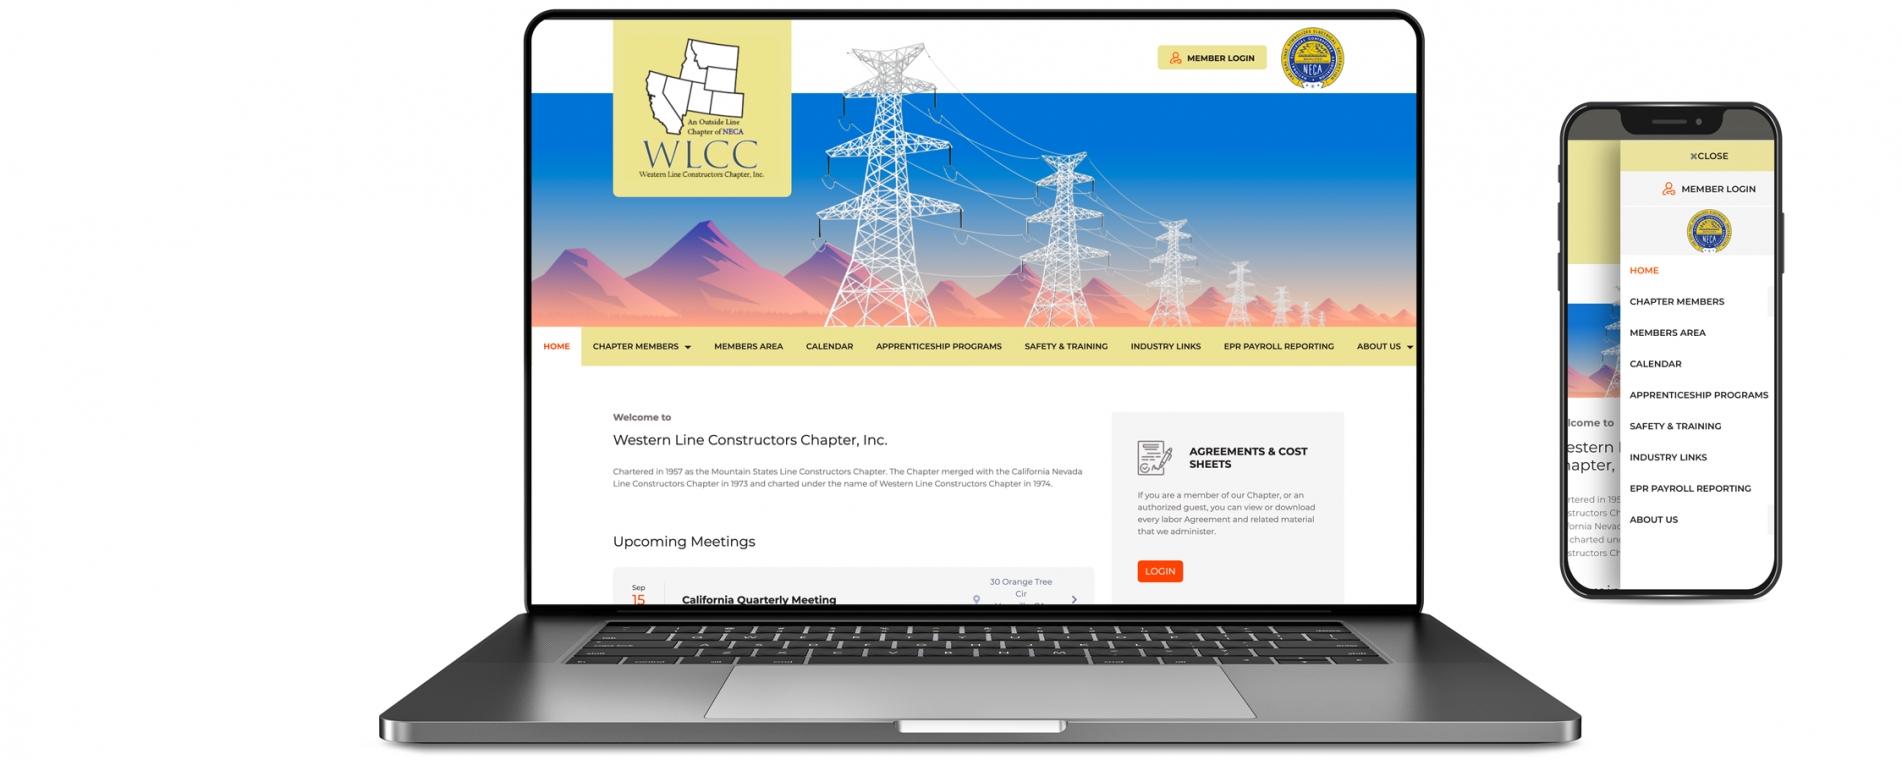 Western Line Constructors Inc